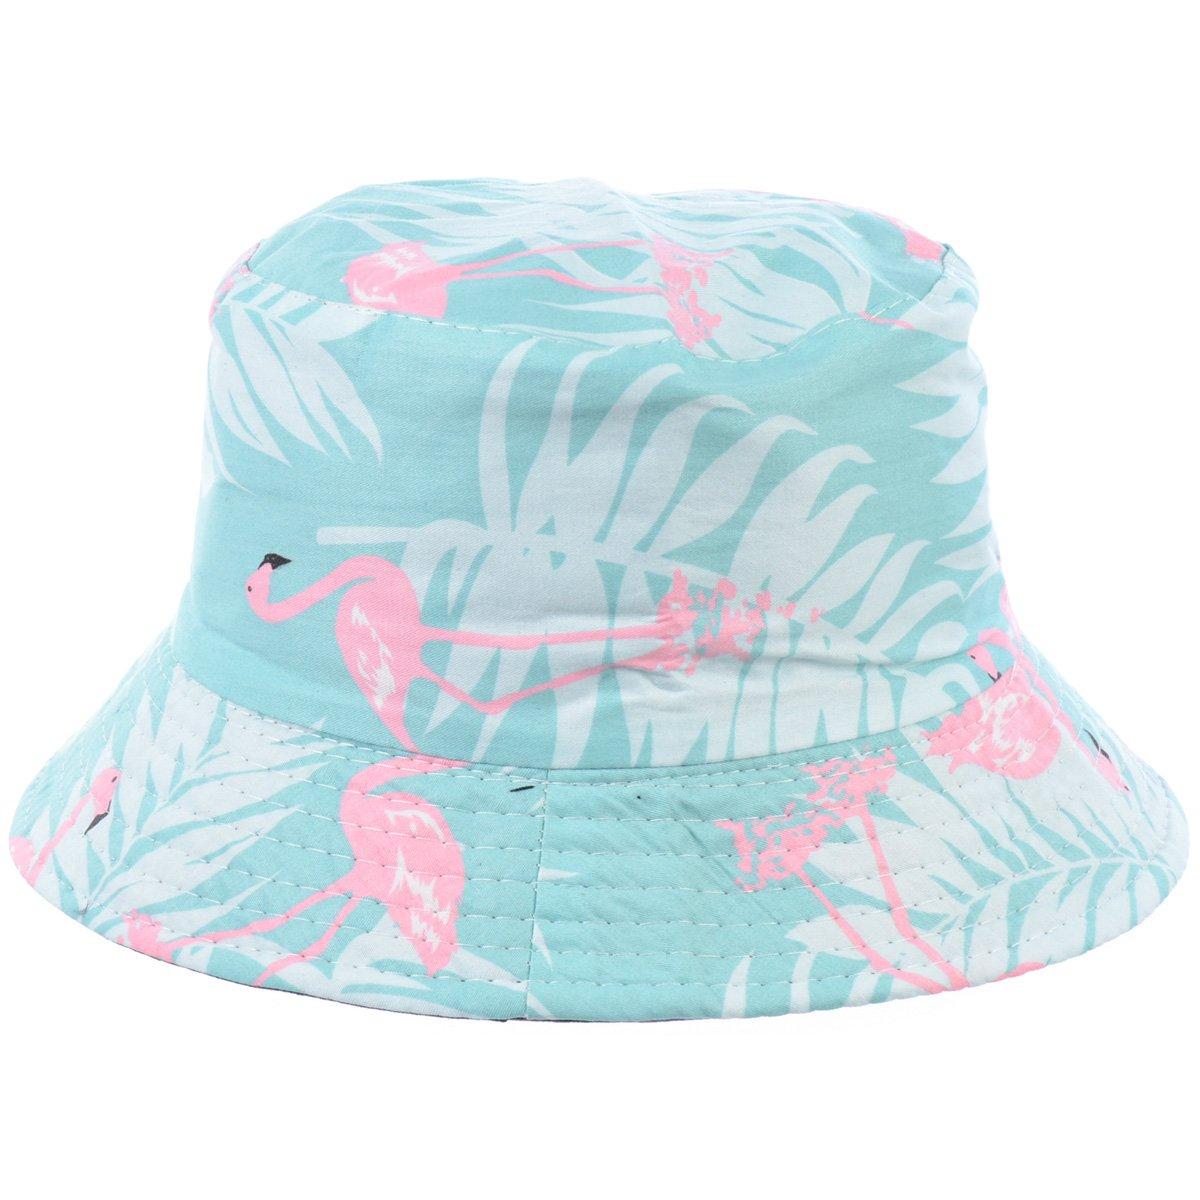 BYOS Fashion Packable Reversible Black Printed Fisherman Bucket Sun Hat, Many Patterns (Flamingo Pastel Mint)